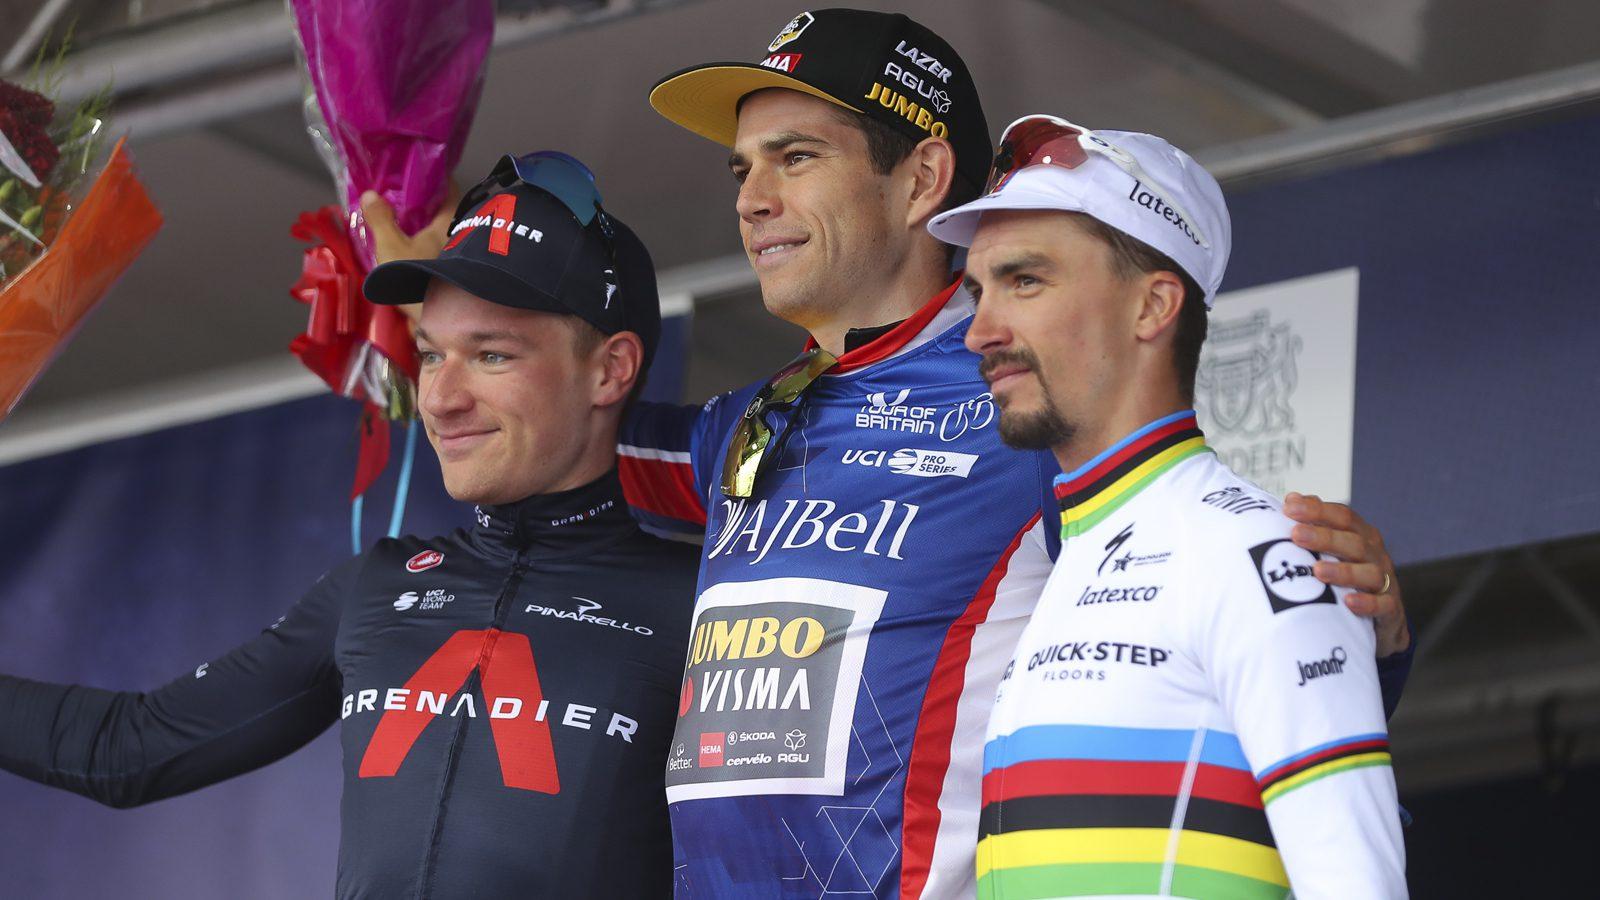 Tour of Britain Wout van Aert podium